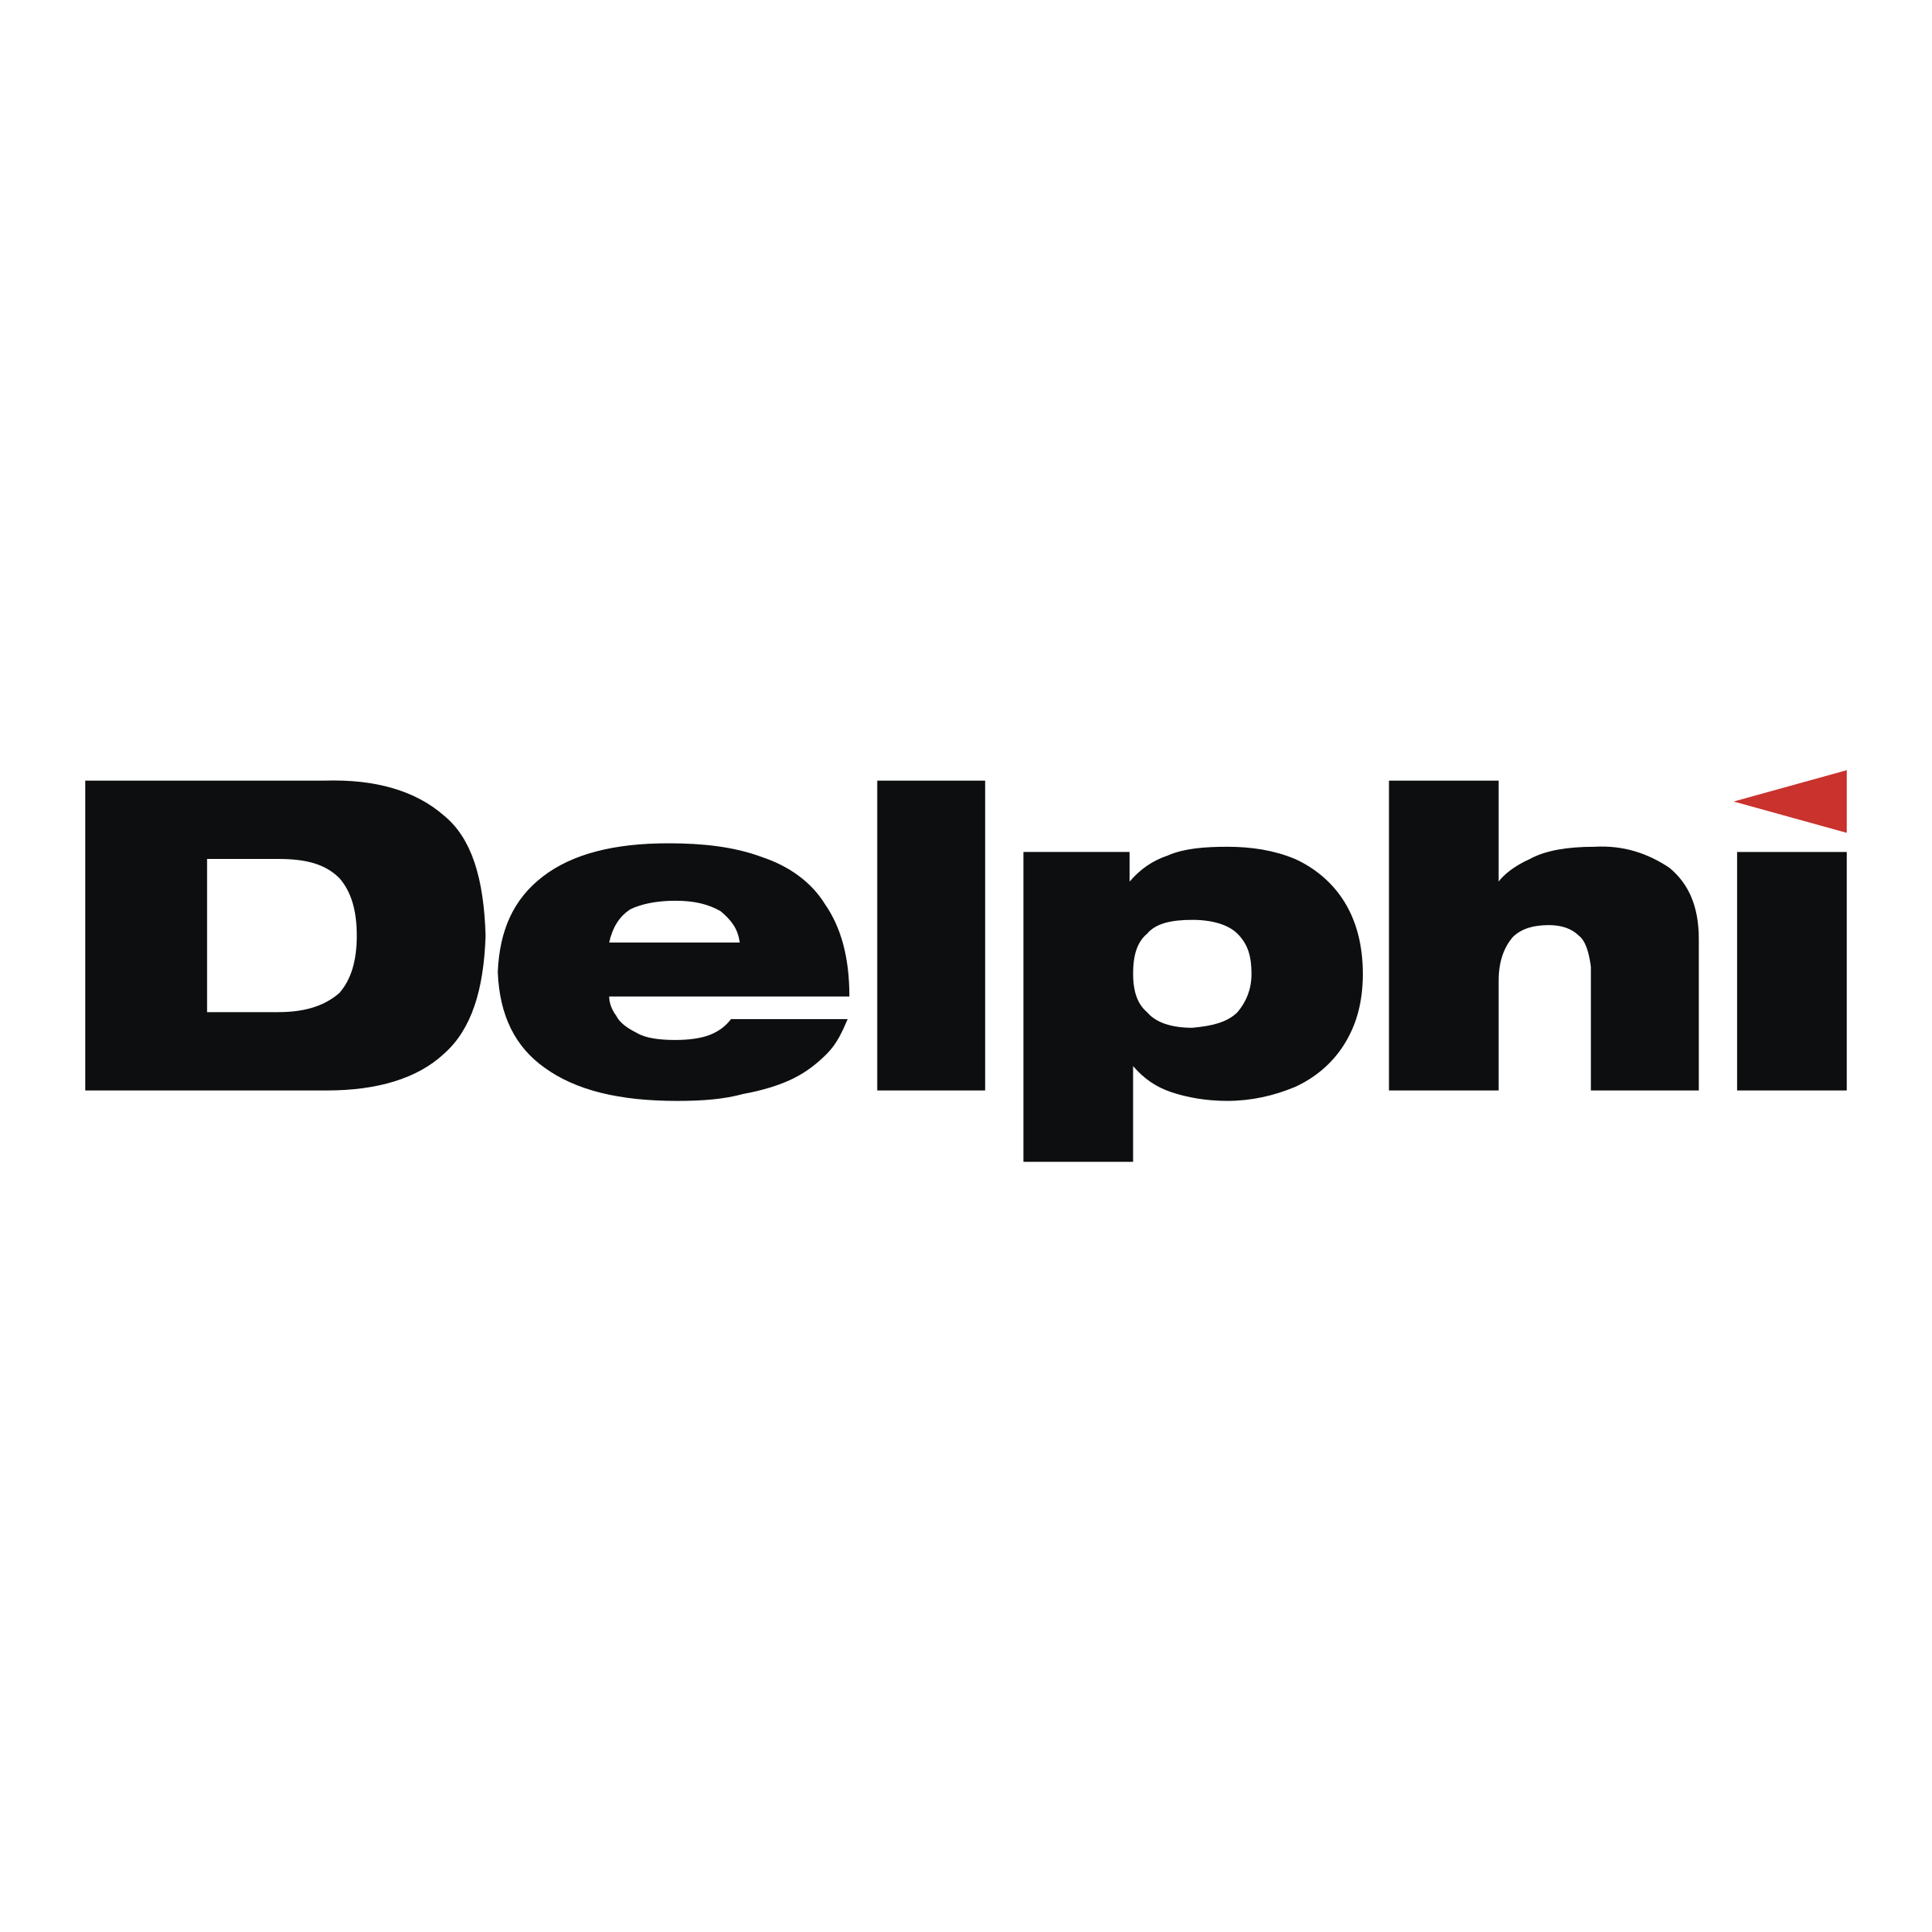 Delphi Logo PNG Transparent & SVG Vector.